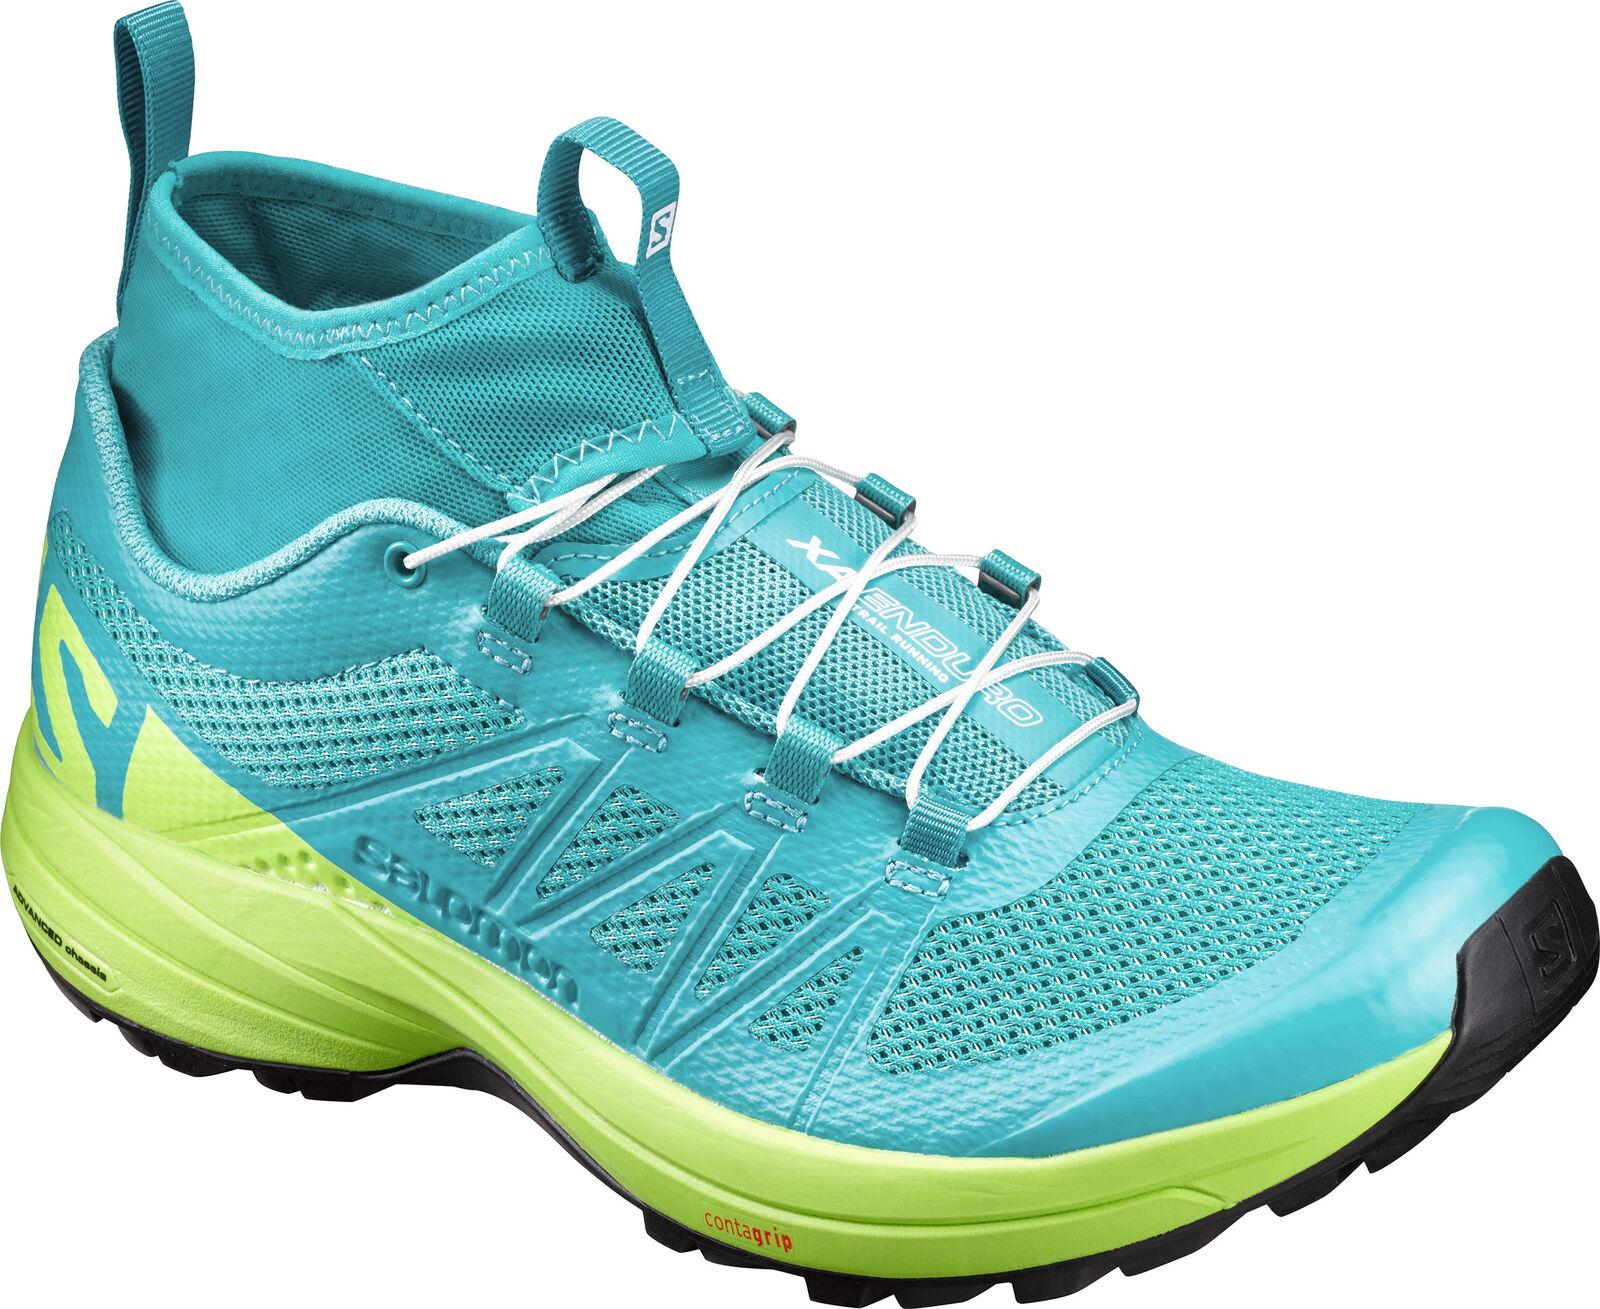 Salomon XA Enduro Trail Running Running Running Zapatos-Azul para Mujer  suministro directo de los fabricantes